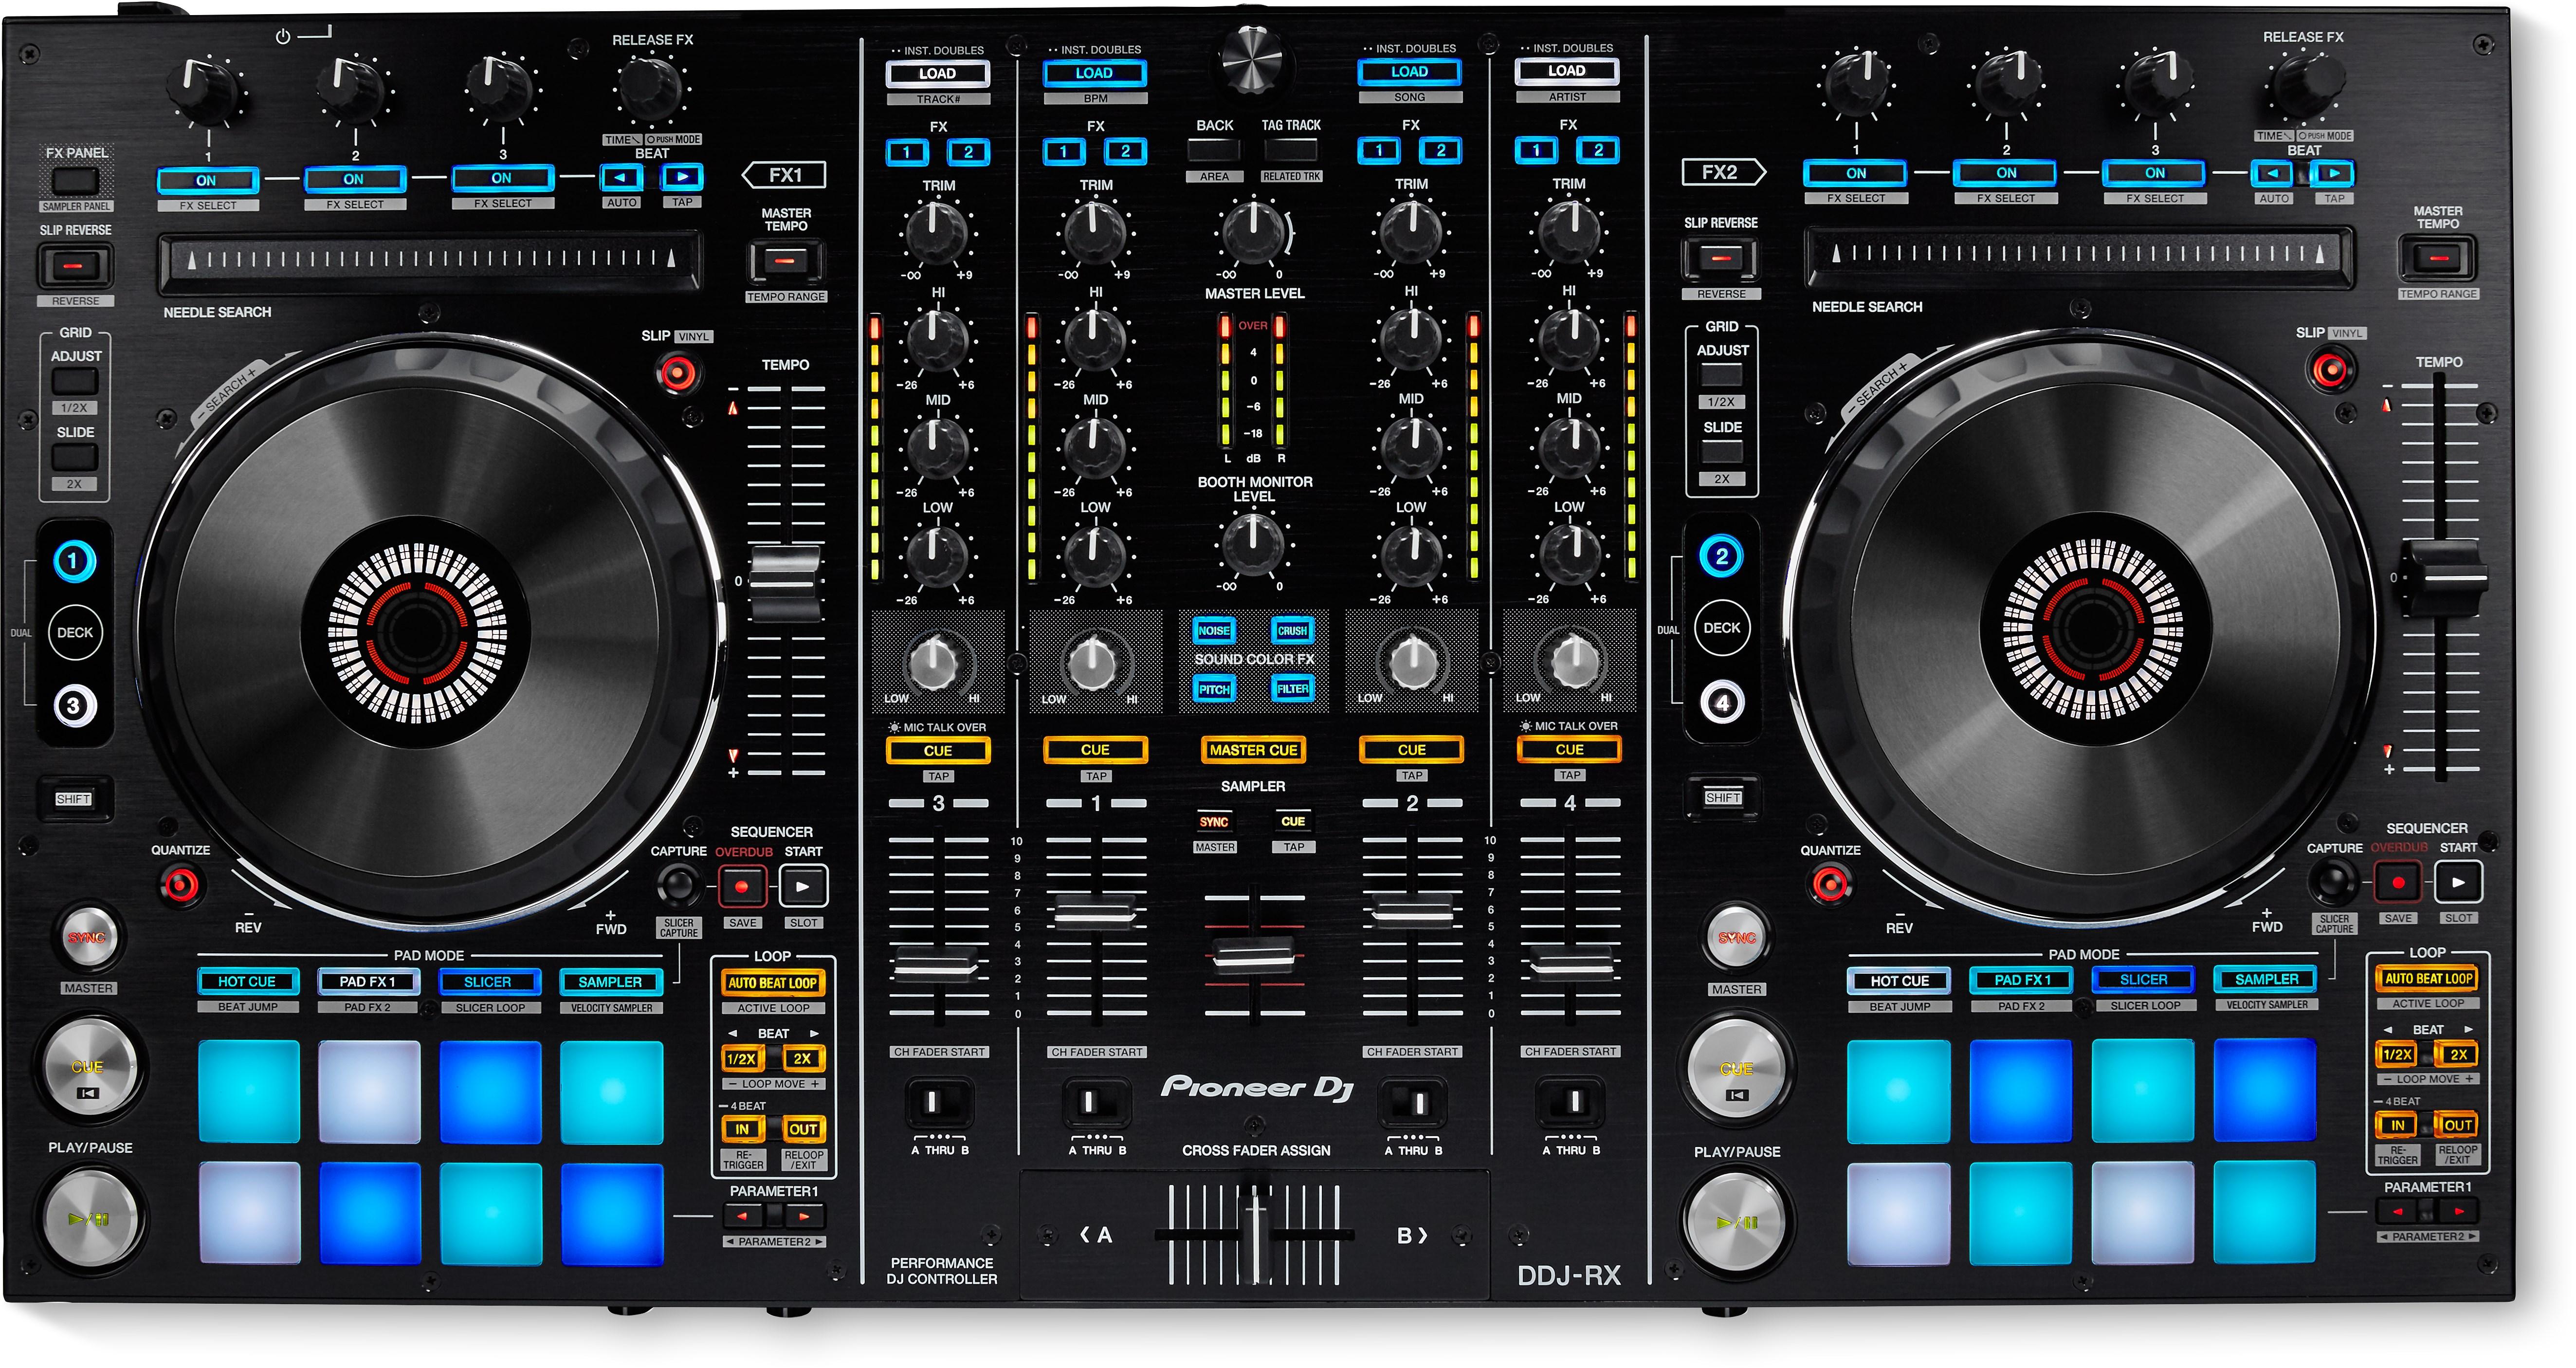 LATEST PIONEER DJ EQUIPMENT